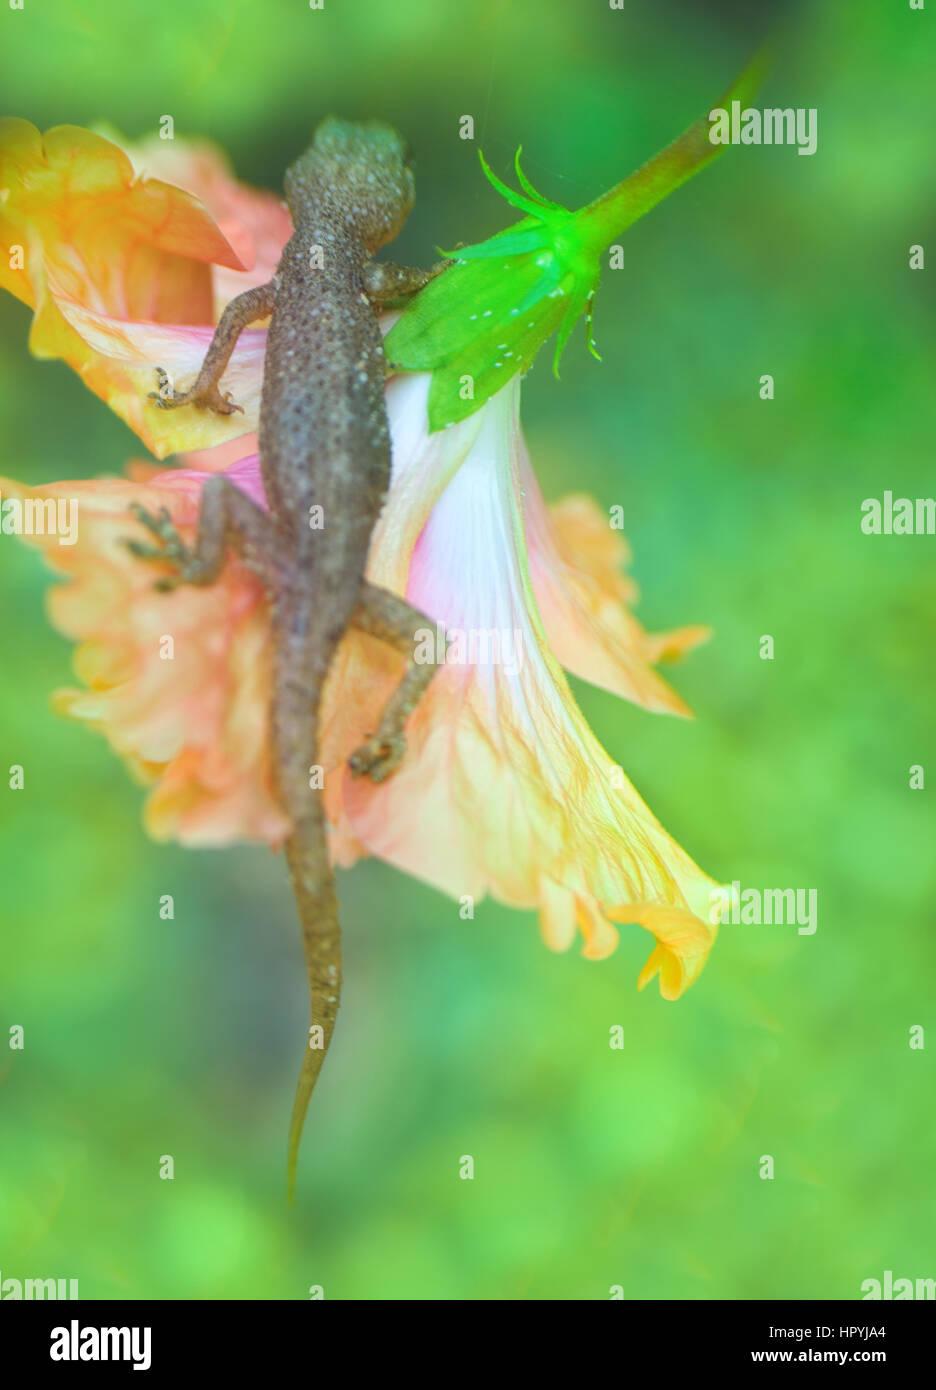 tropical house gecko on red flower like cape honeysuckle. india